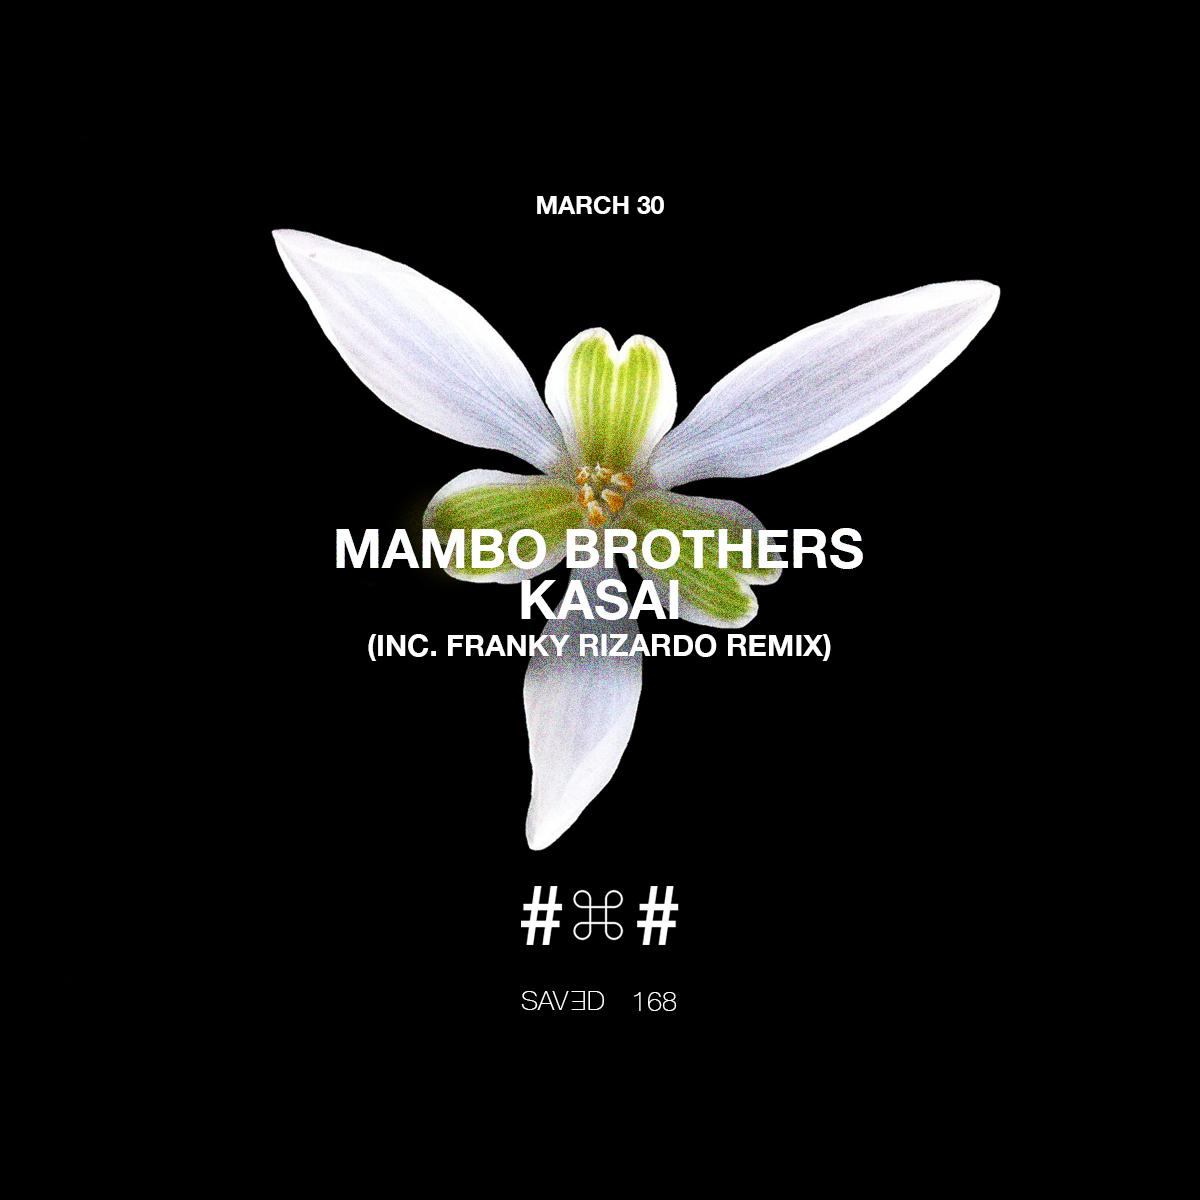 Mambo Brothers release KASAI + Franky Rizardo remix